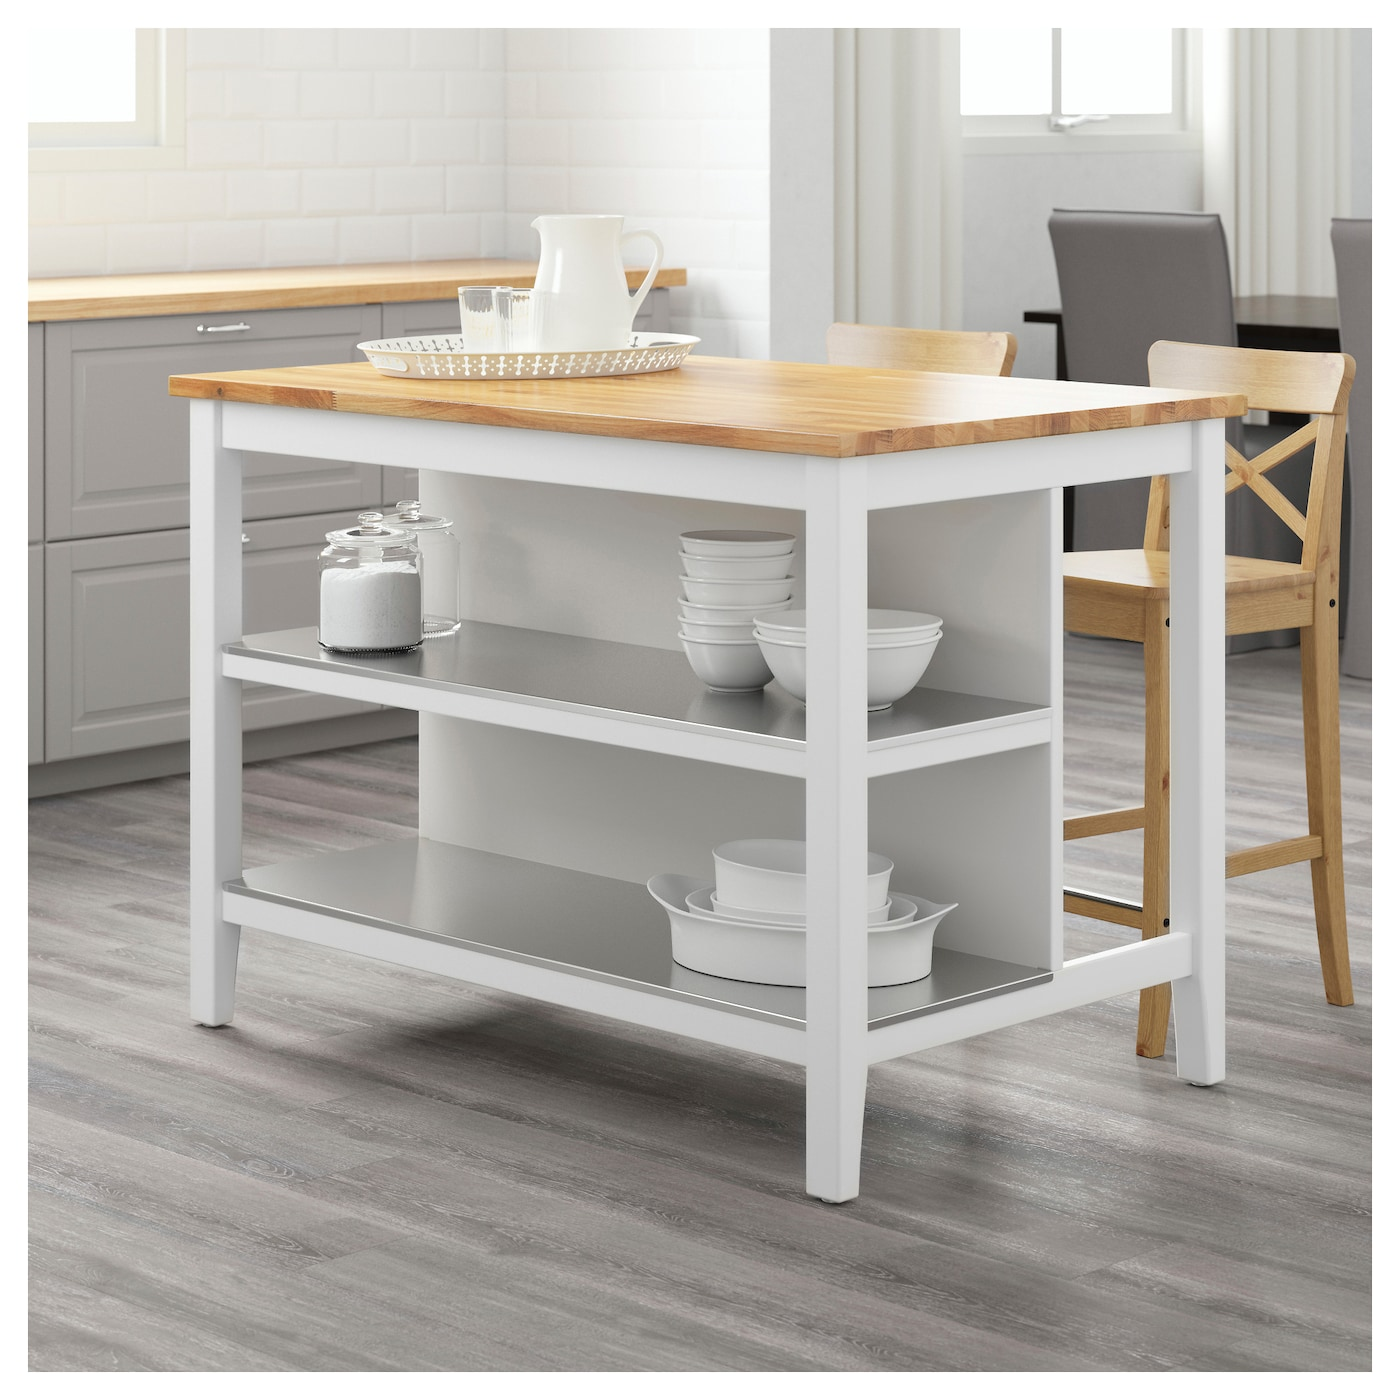 Ikea Kitchen Island White Oak